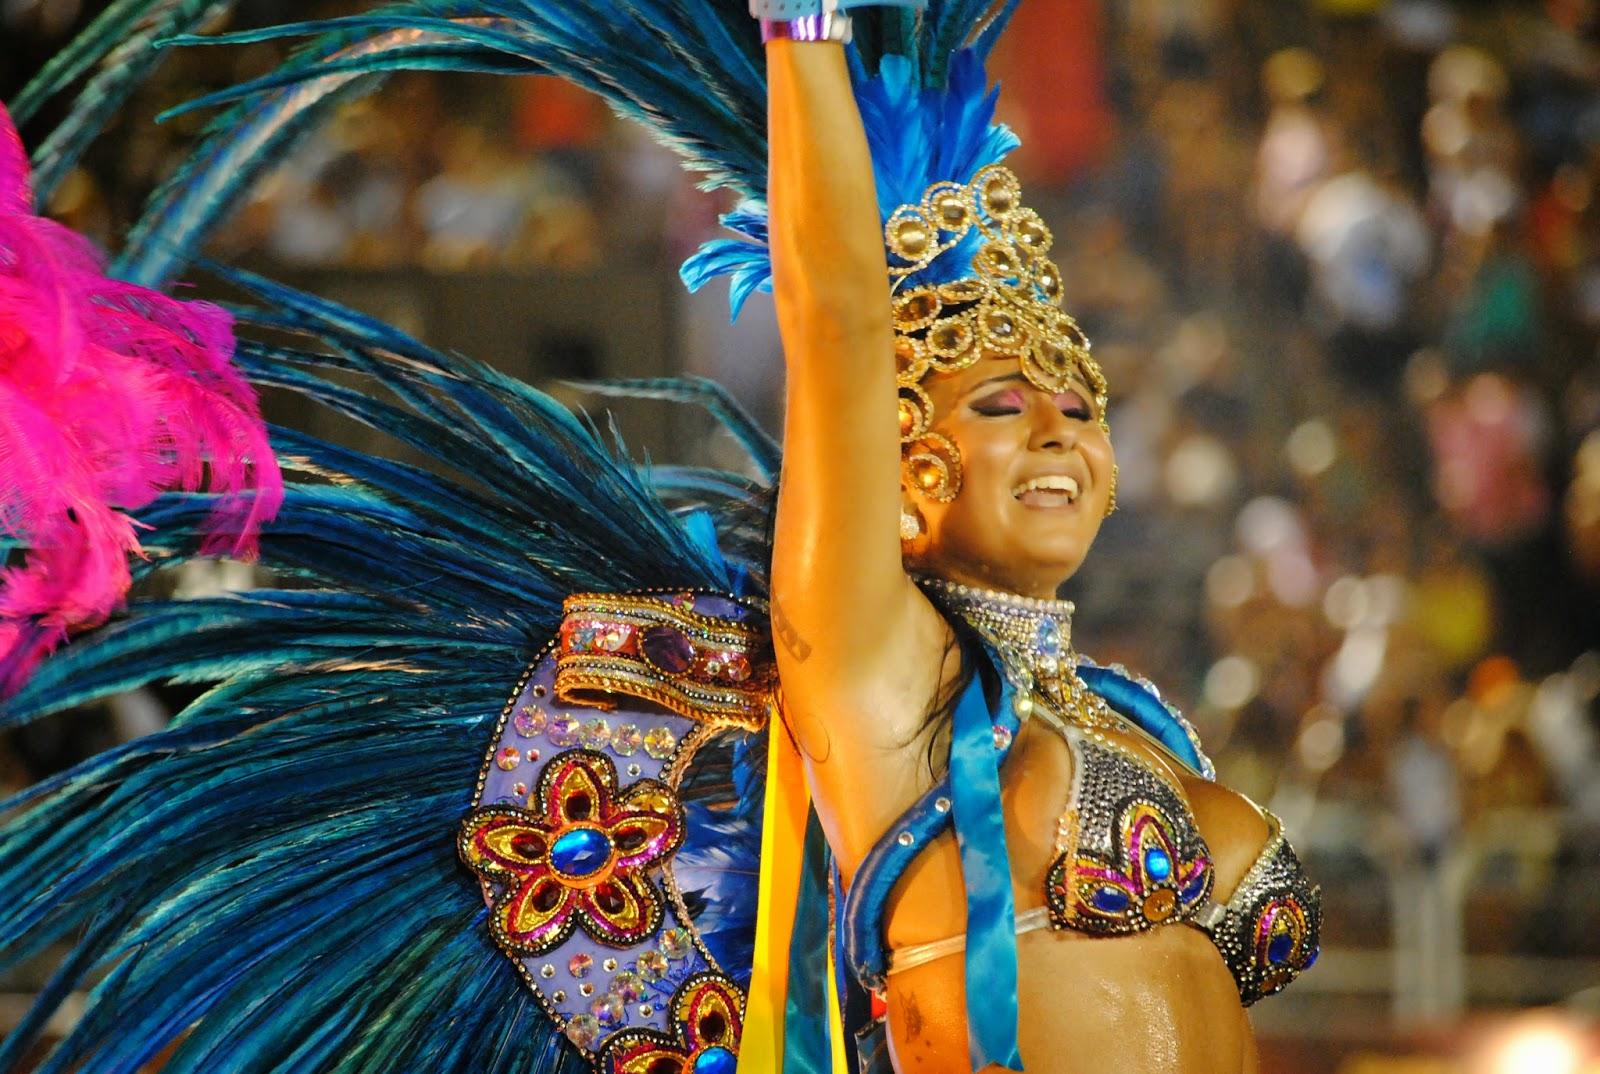 Sambadrom 2012 in Rio-de-Janeiro, Brazil